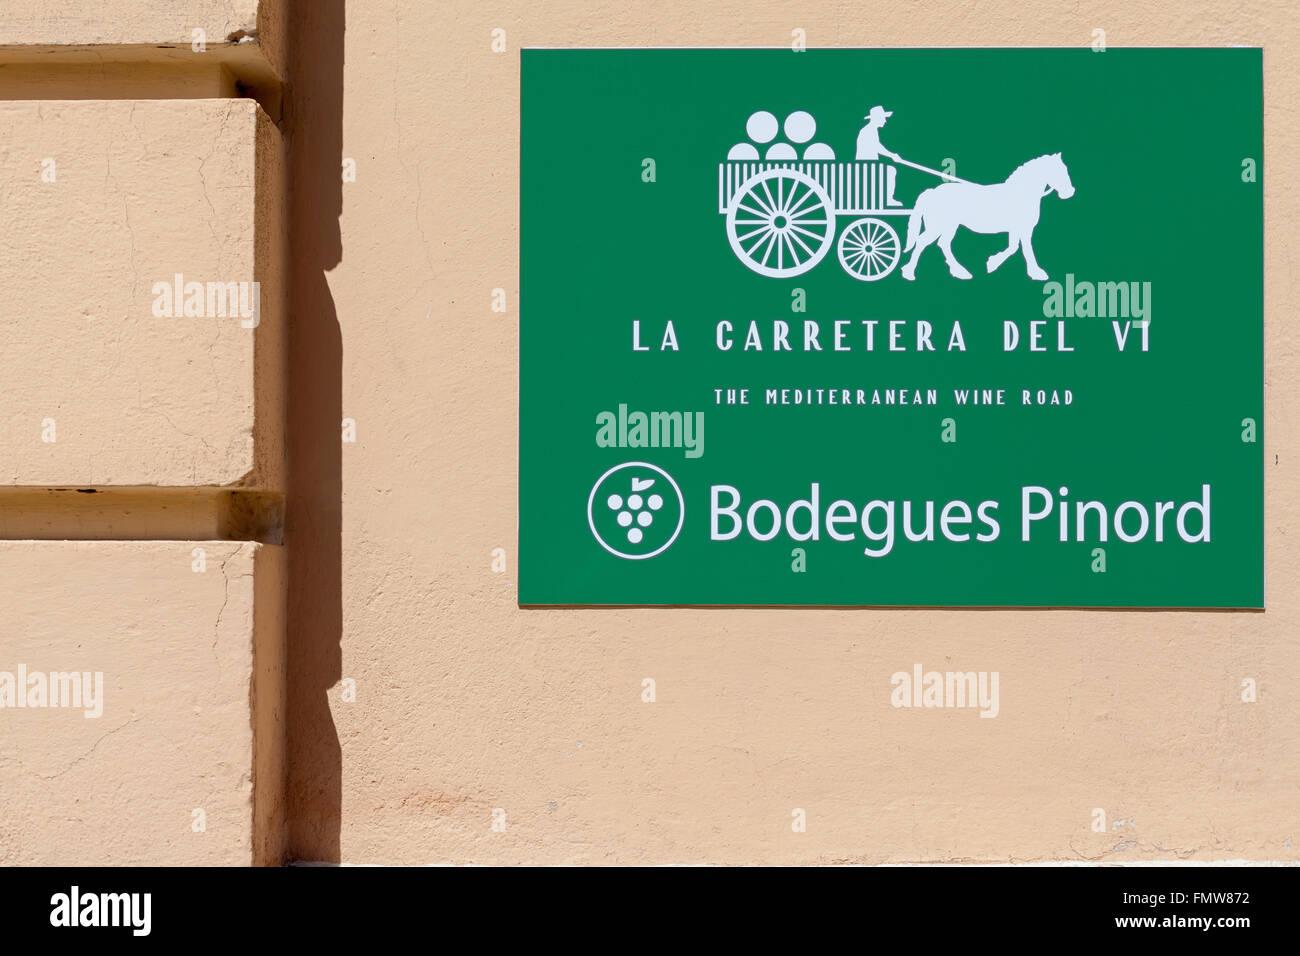 SIgn la carretera del vi mediterranean wine road,bodegues pinord,Vilafranca del Penedès,Catalonia,Spain. - Stock Image